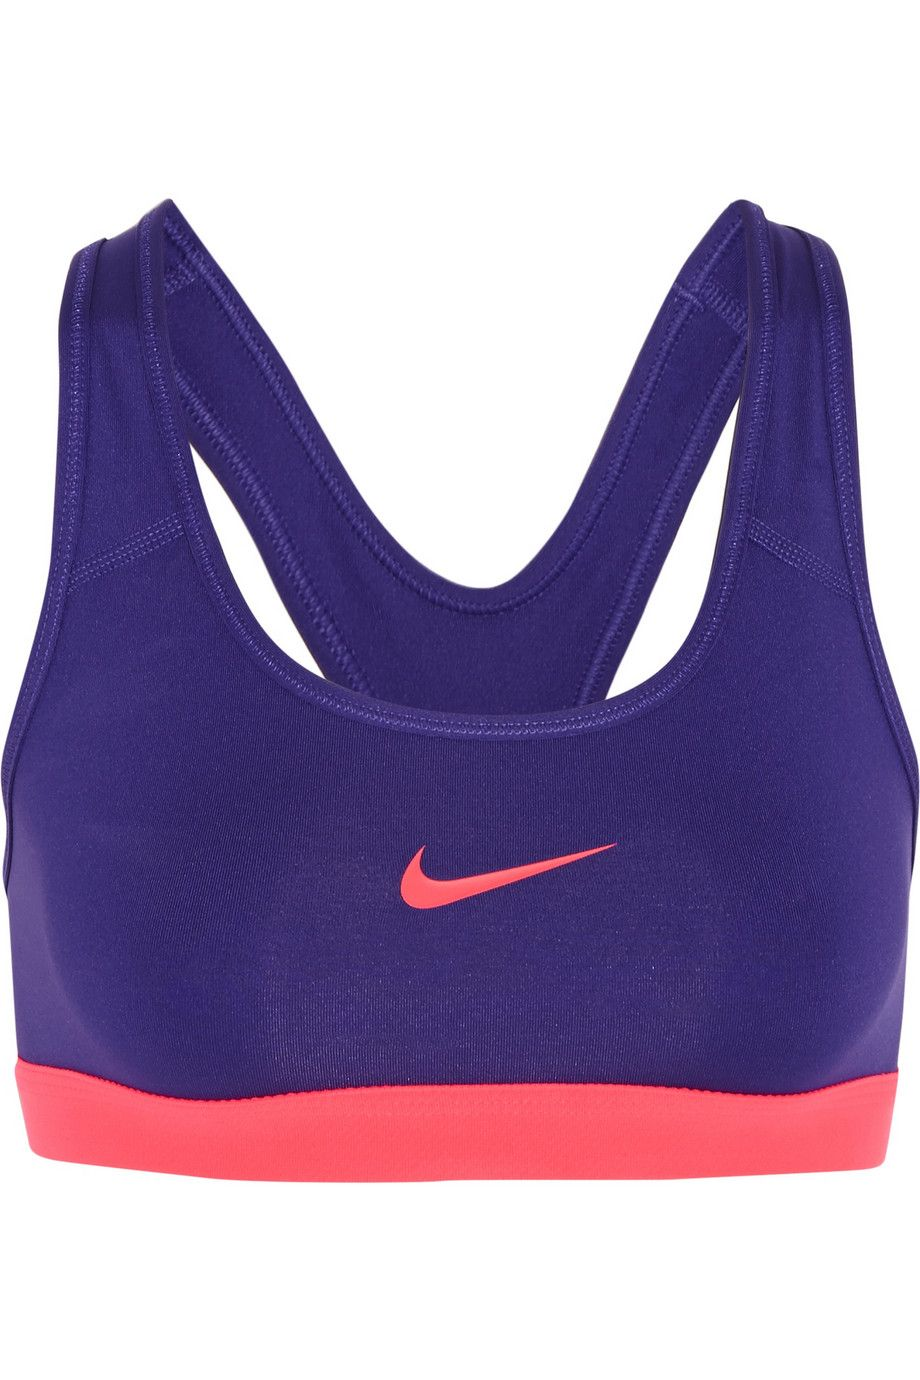 Nike pro classic drifit stretchjersey sports bra net